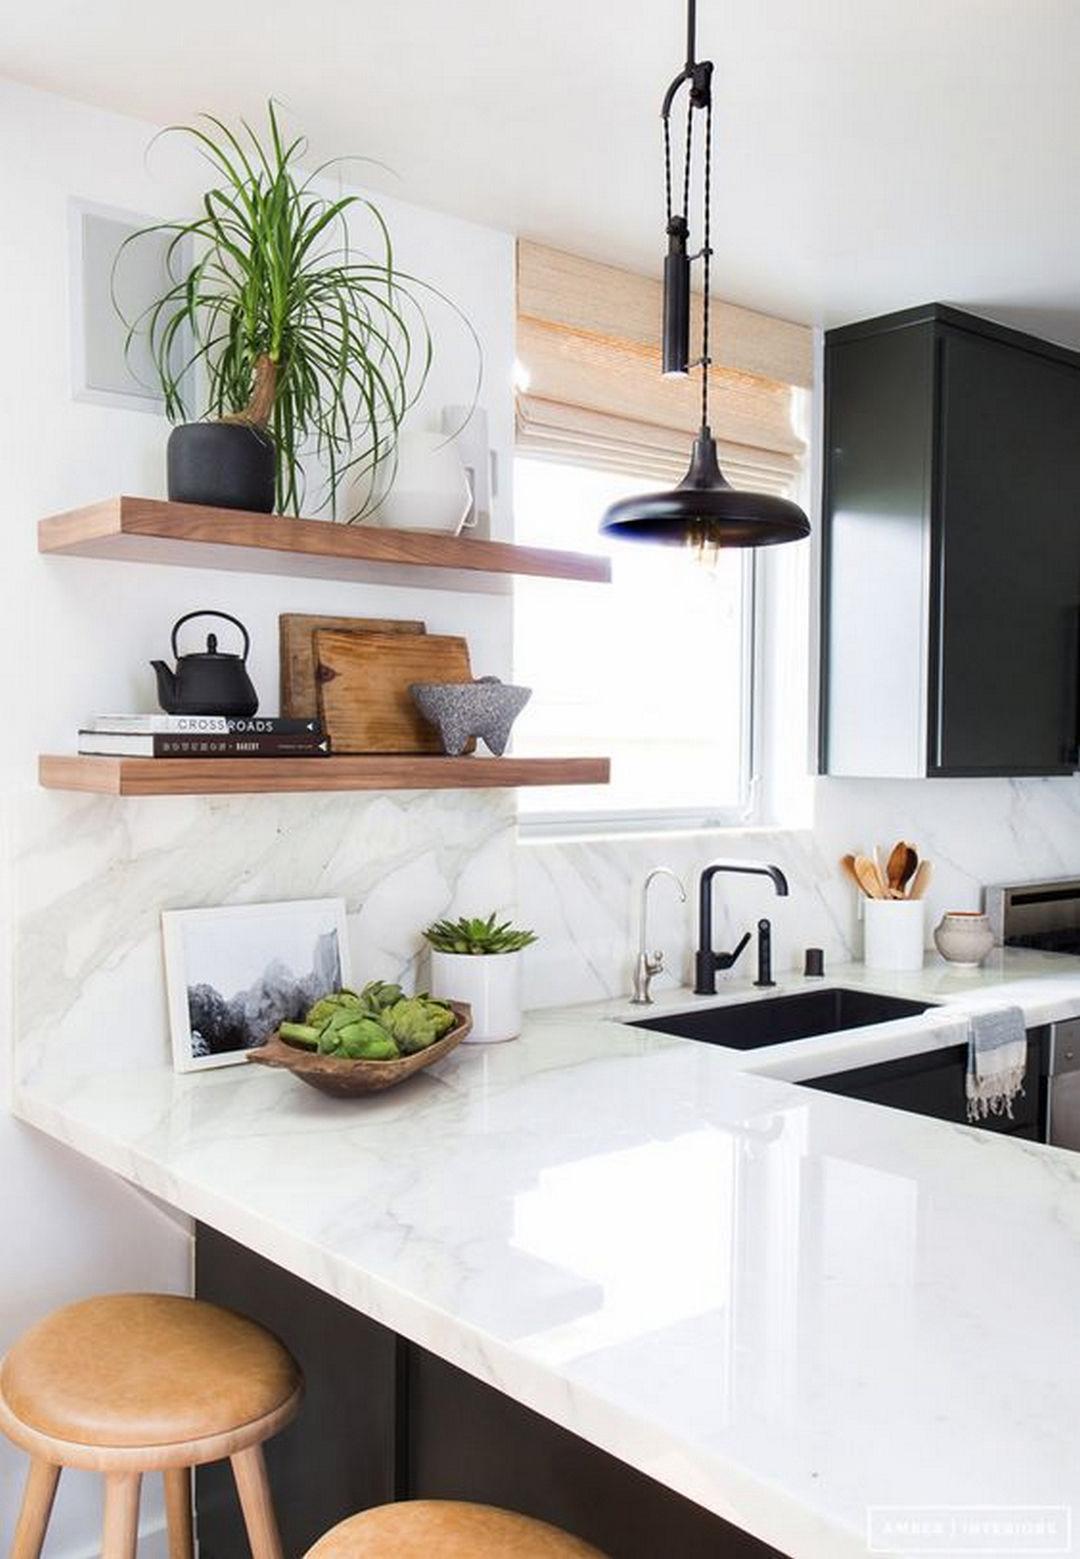 interior design fo open shelving kitchen. 28 Nice Open Shelving Ideas For Minimalist Interior Design Fo Kitchen